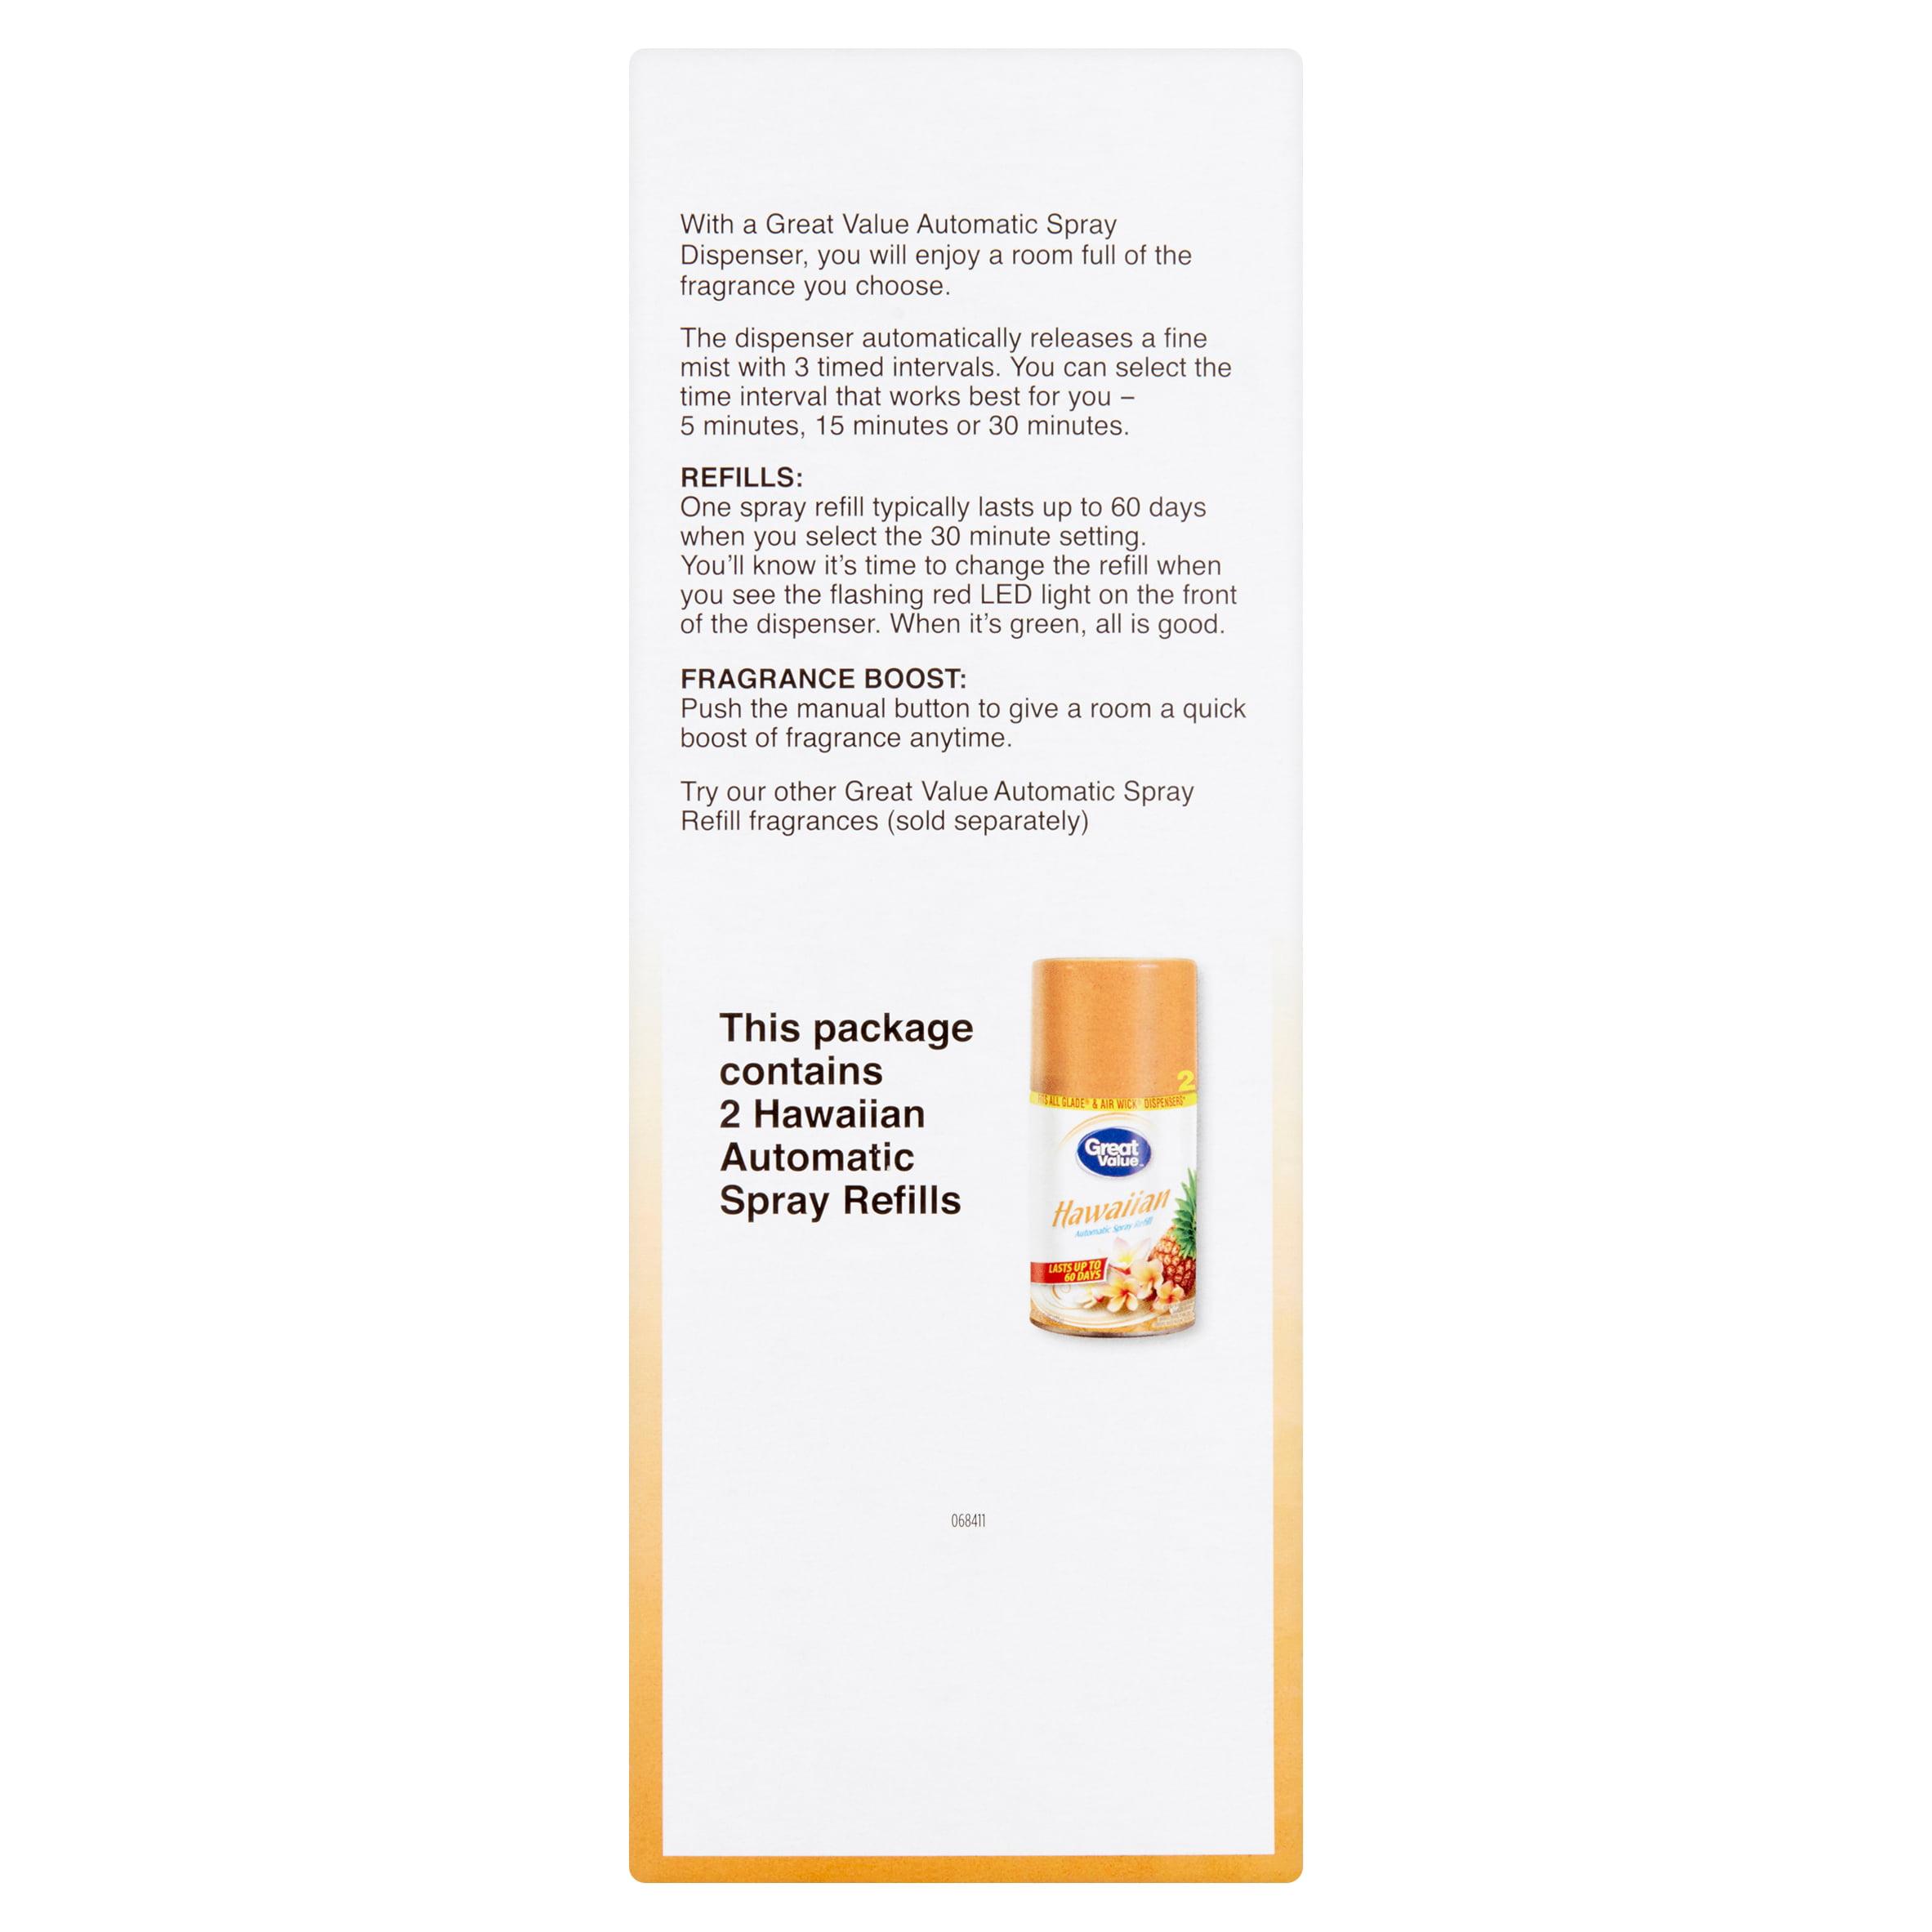 Great Value Hawaiian Automatic Spray Kit Twin Pack - Walmart com